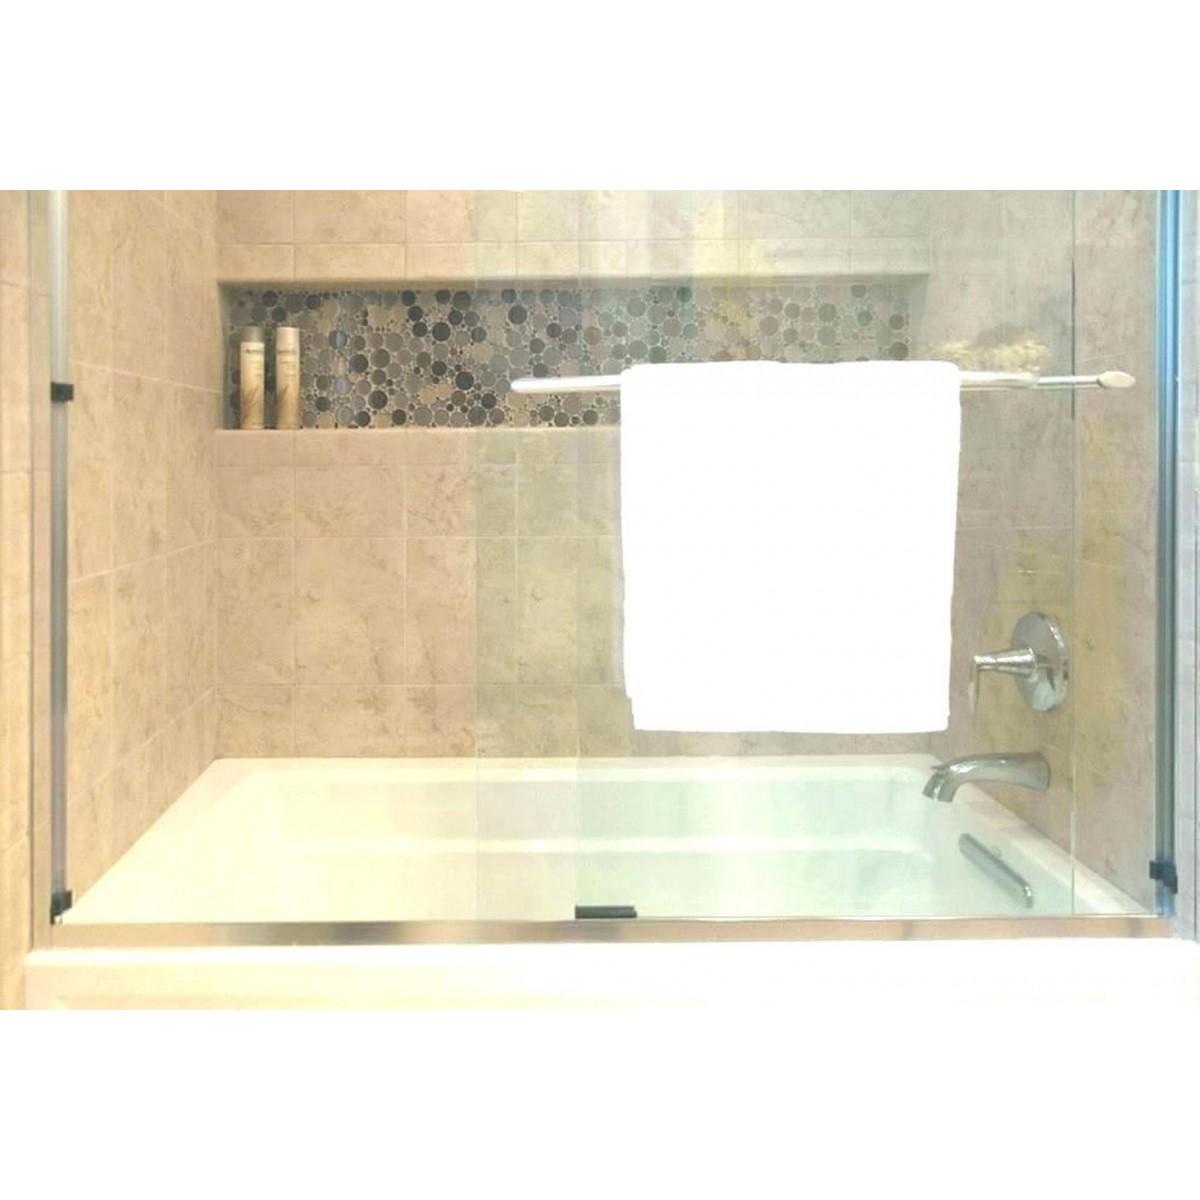 Huge Ready For Tile Waterproof Leak Proof 14 X 50 Square Bathroom Recessed Shower Niche Single Bathroom Shelf Organizer Storage For Shampoo Toiletry Storage Flush Mount Installation